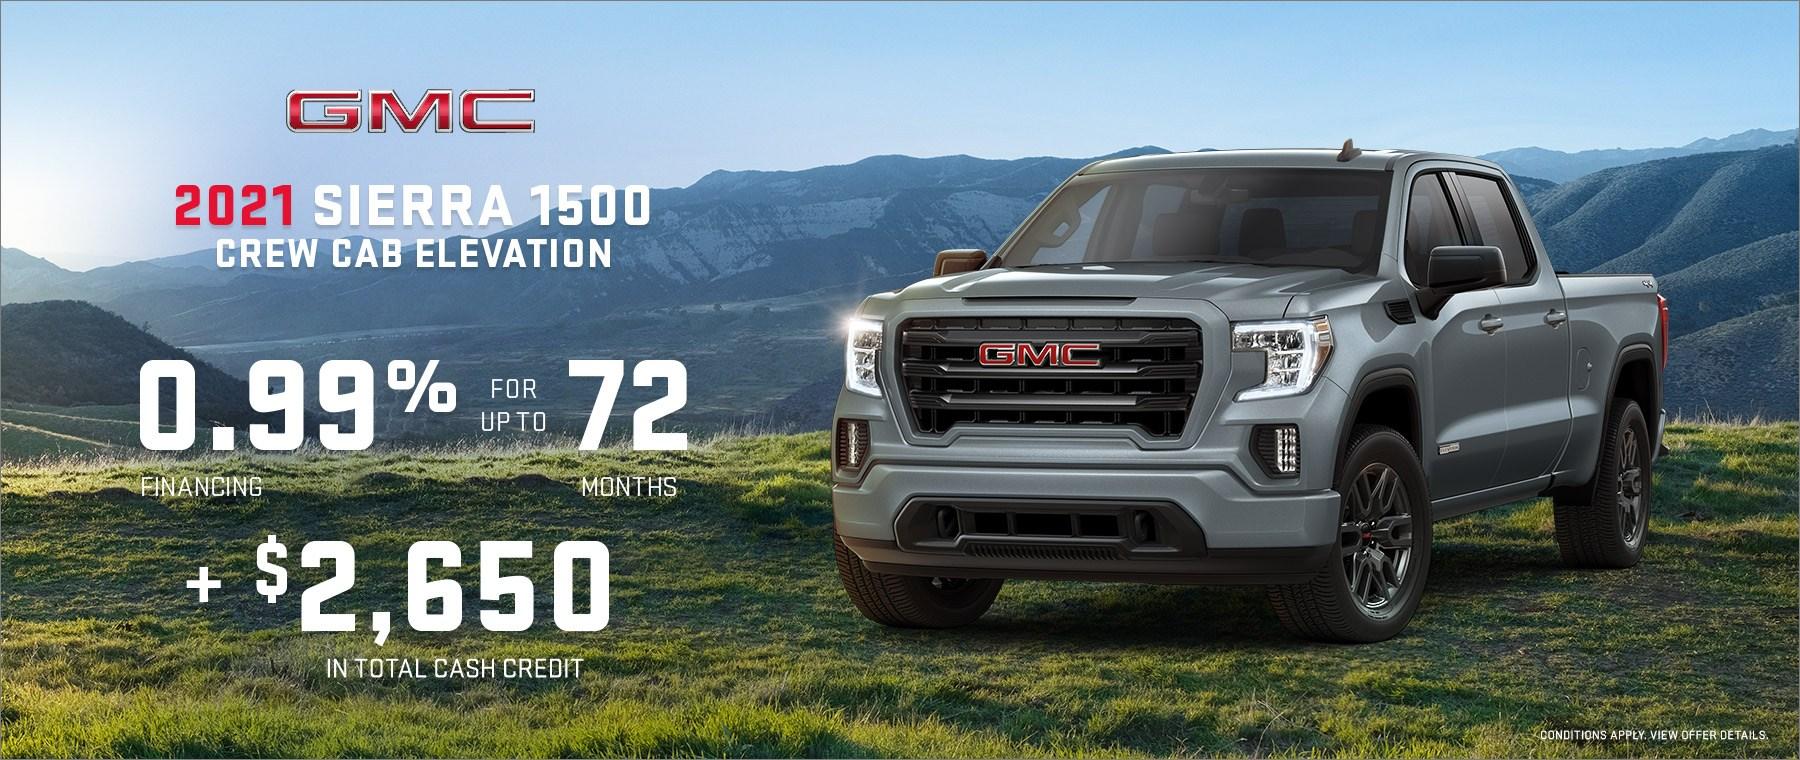 Truck Nation – 2021 GMC Sierra 1500